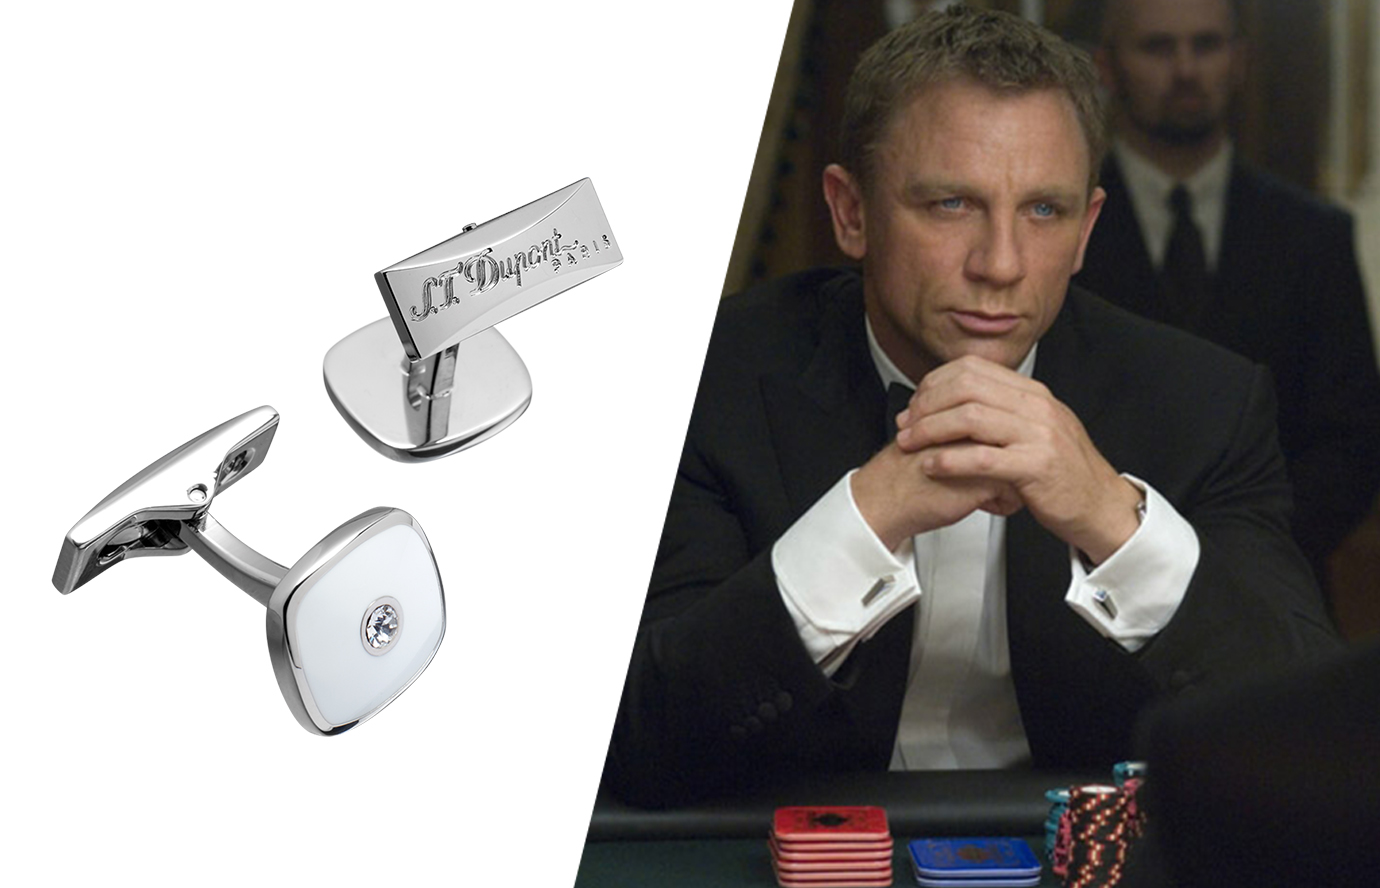 suit accessories: the cufflinks